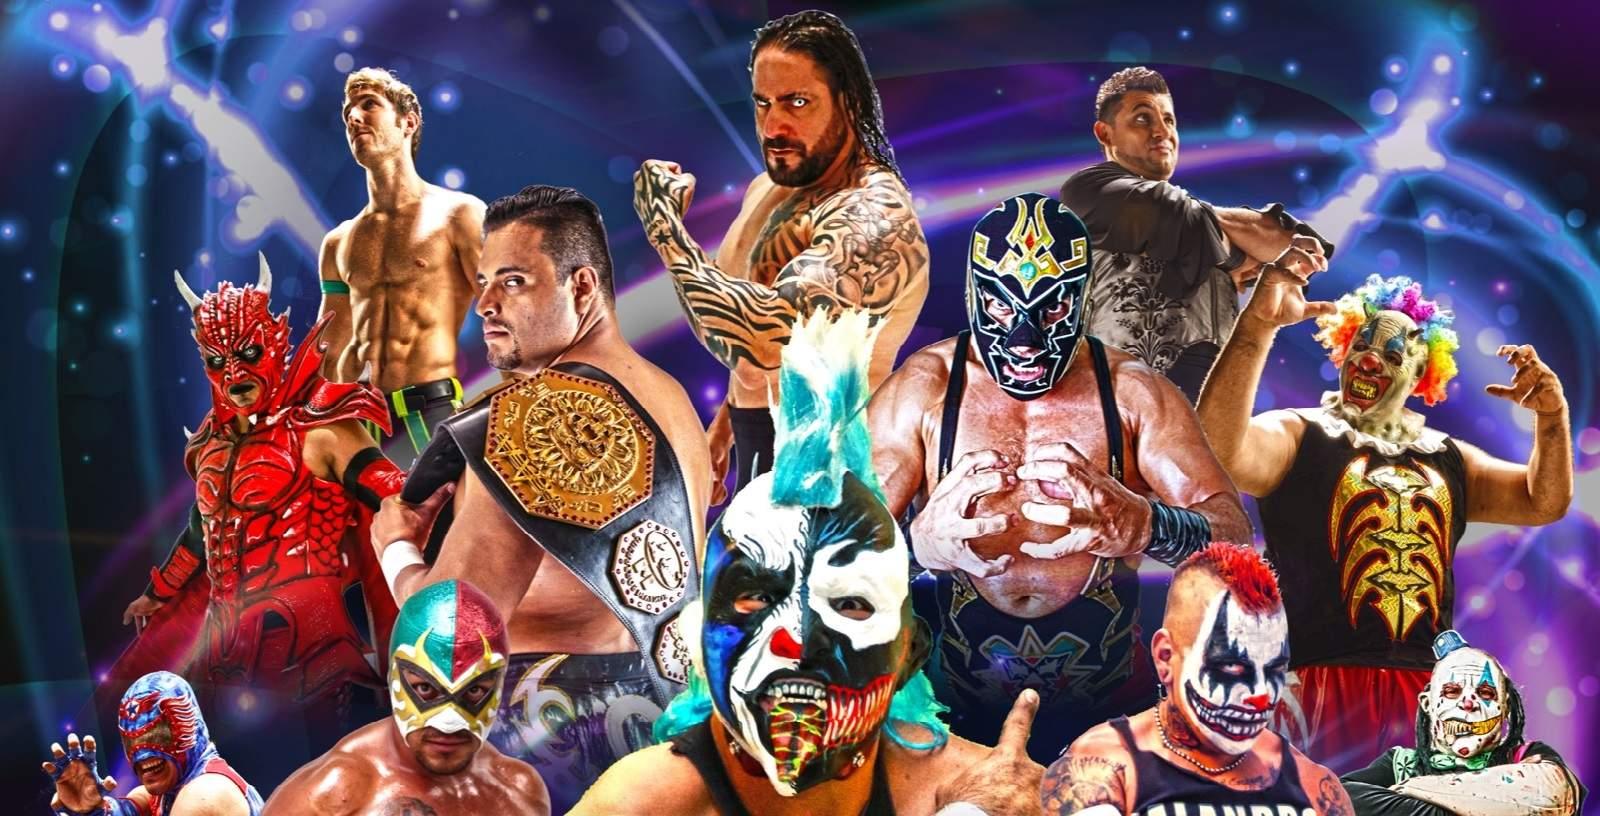 AAA: Cartel completo para Chilpancingo - 17/12/2016 - Continúa la Guerra entre Dr. Wagner Jr. y Psycho Clown 1